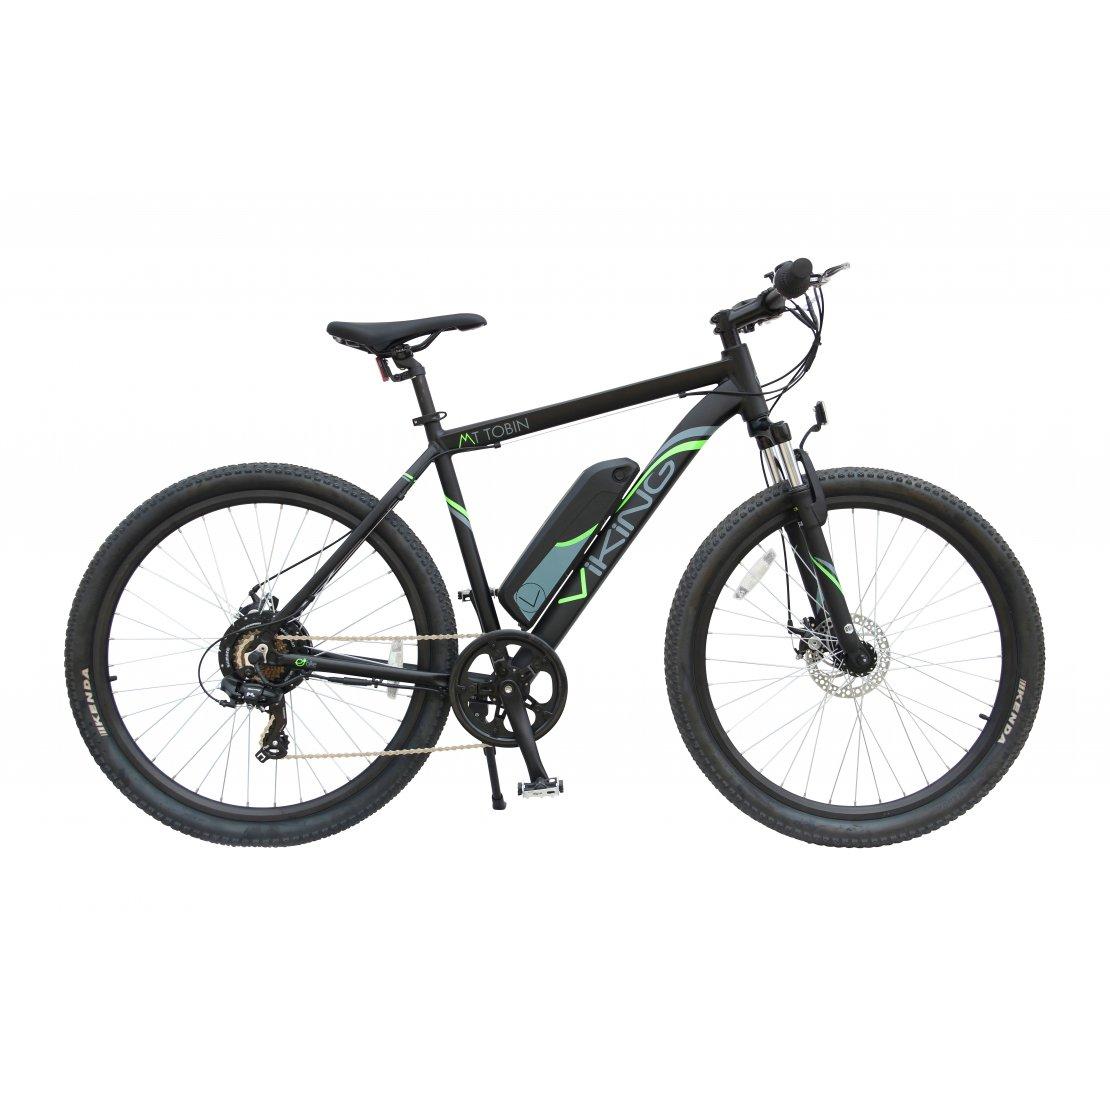 18 Mt Tobin 7 Speed 36v E Bike 650b Wheel Black